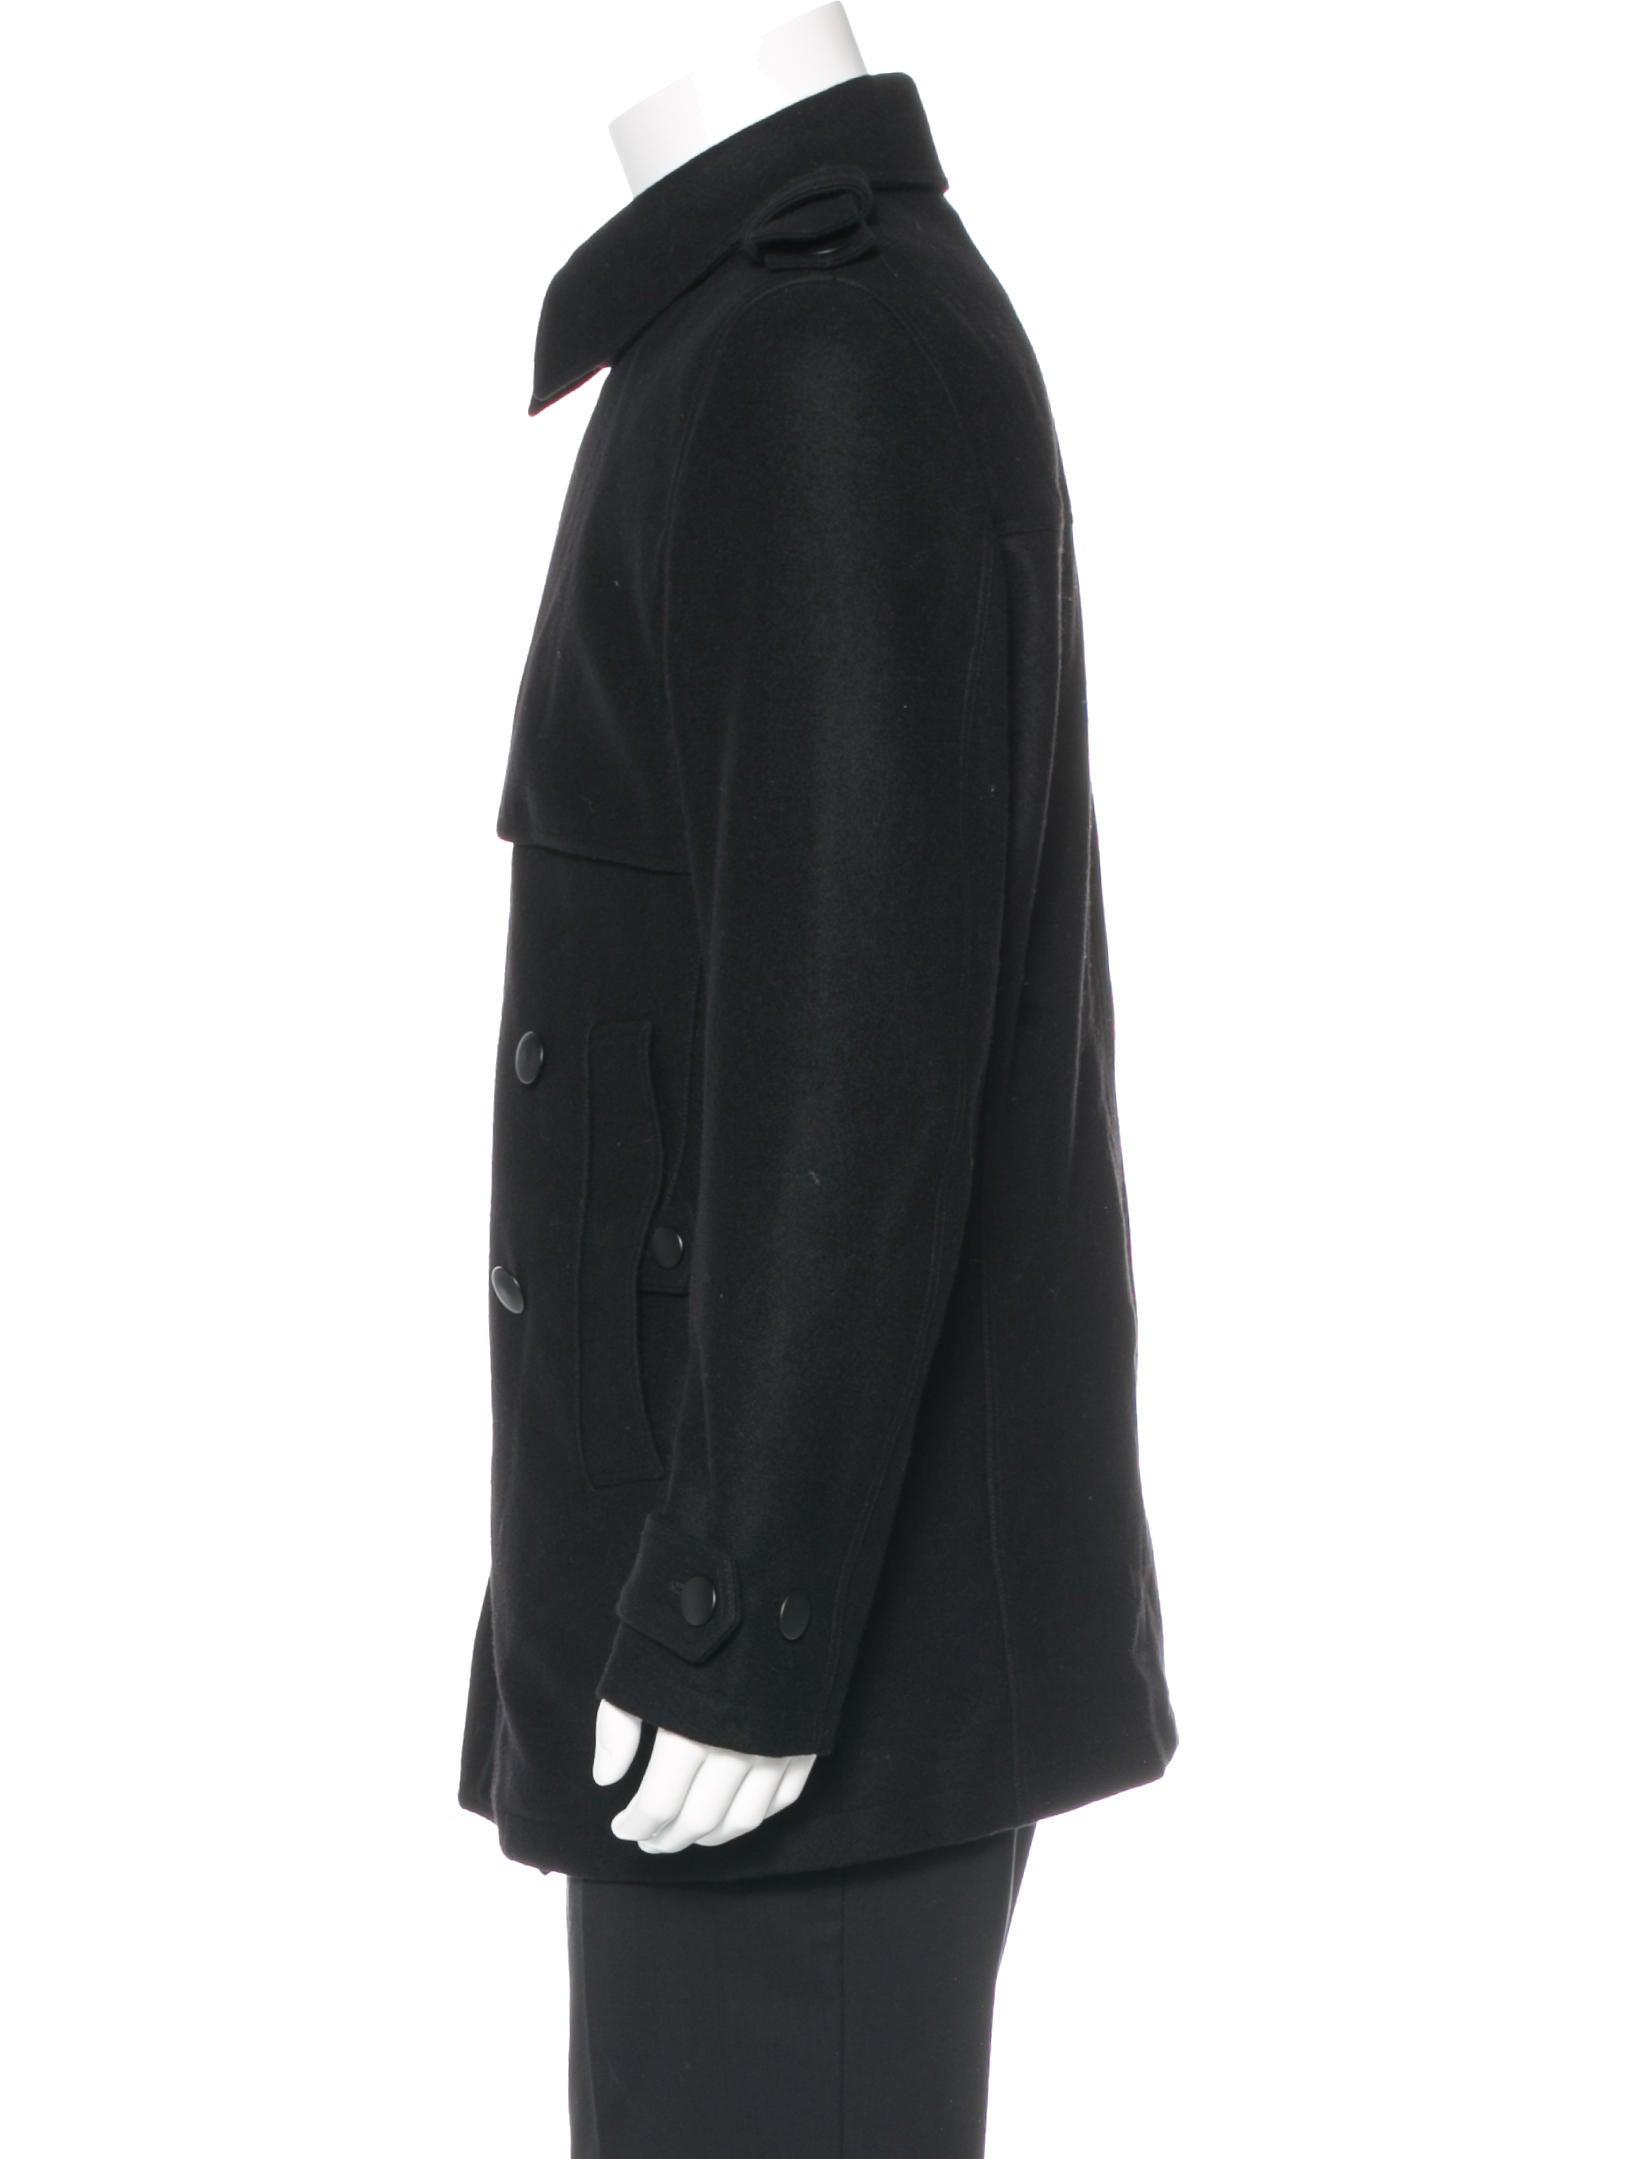 Yves saint laurent logo wool peacoat clothing yve50814 for Yves saint laurent logo shirt